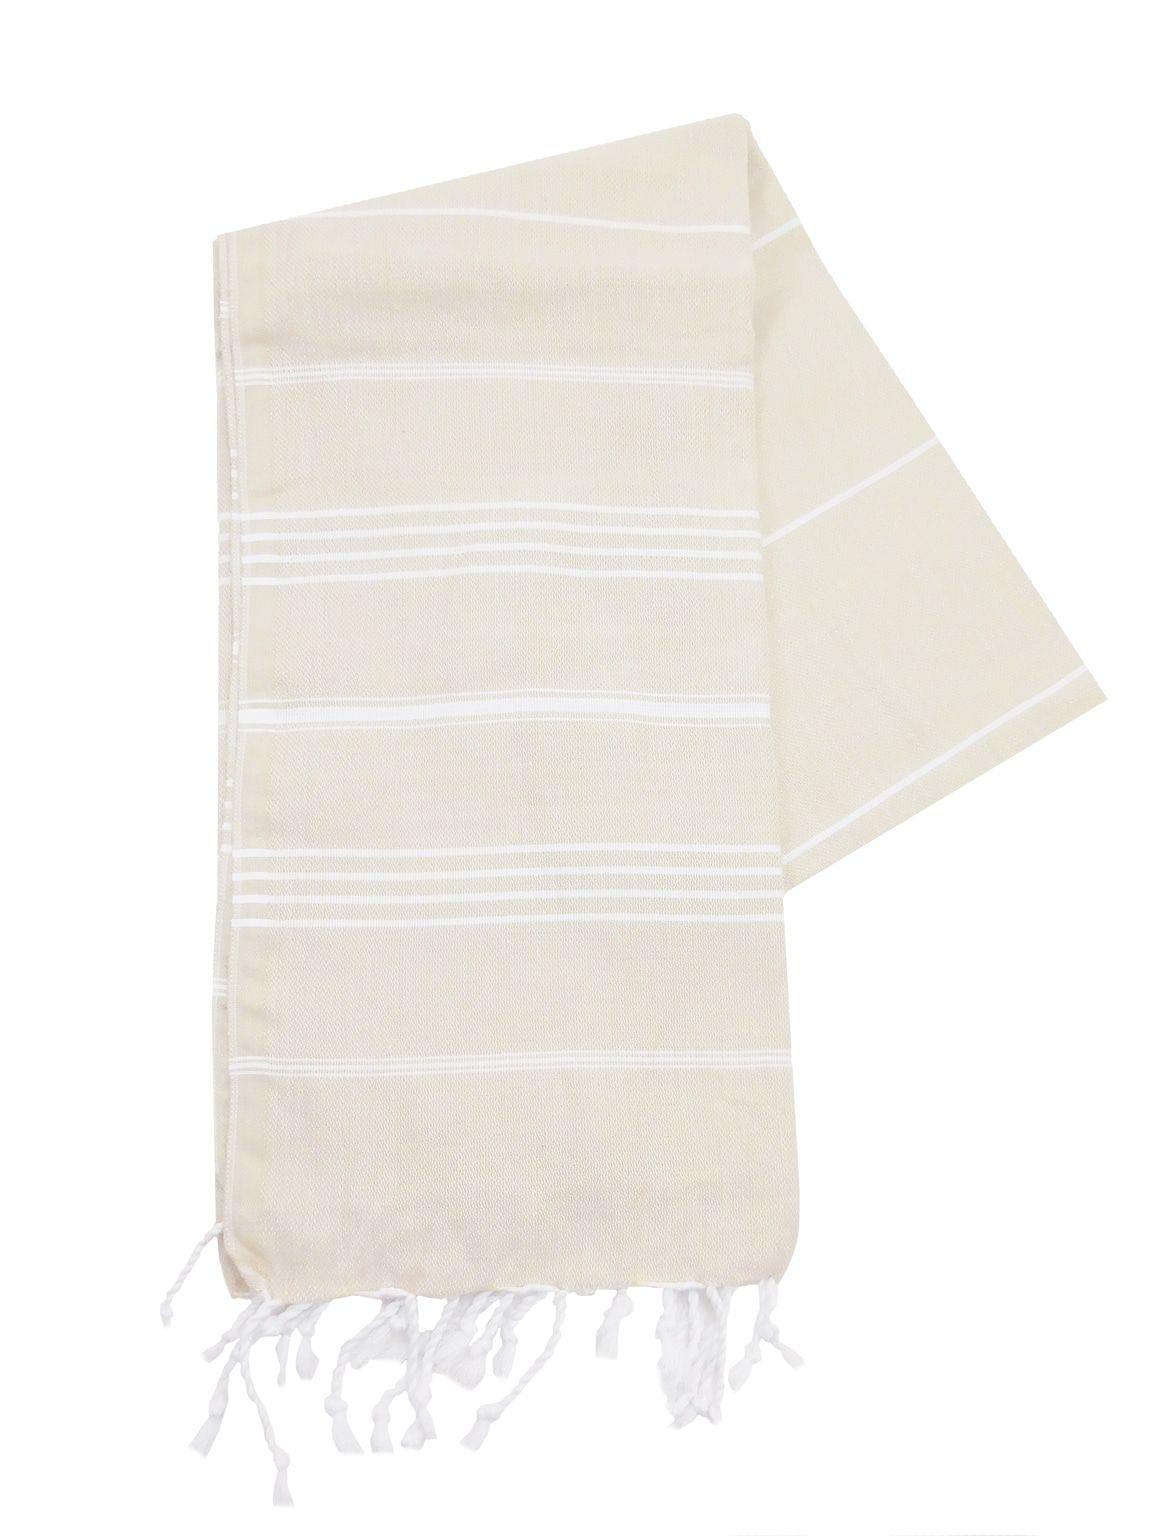 77b1debf8fb Merk: the one towelling model: hamam handdoek materiaal: 100% terry katoen  kleur